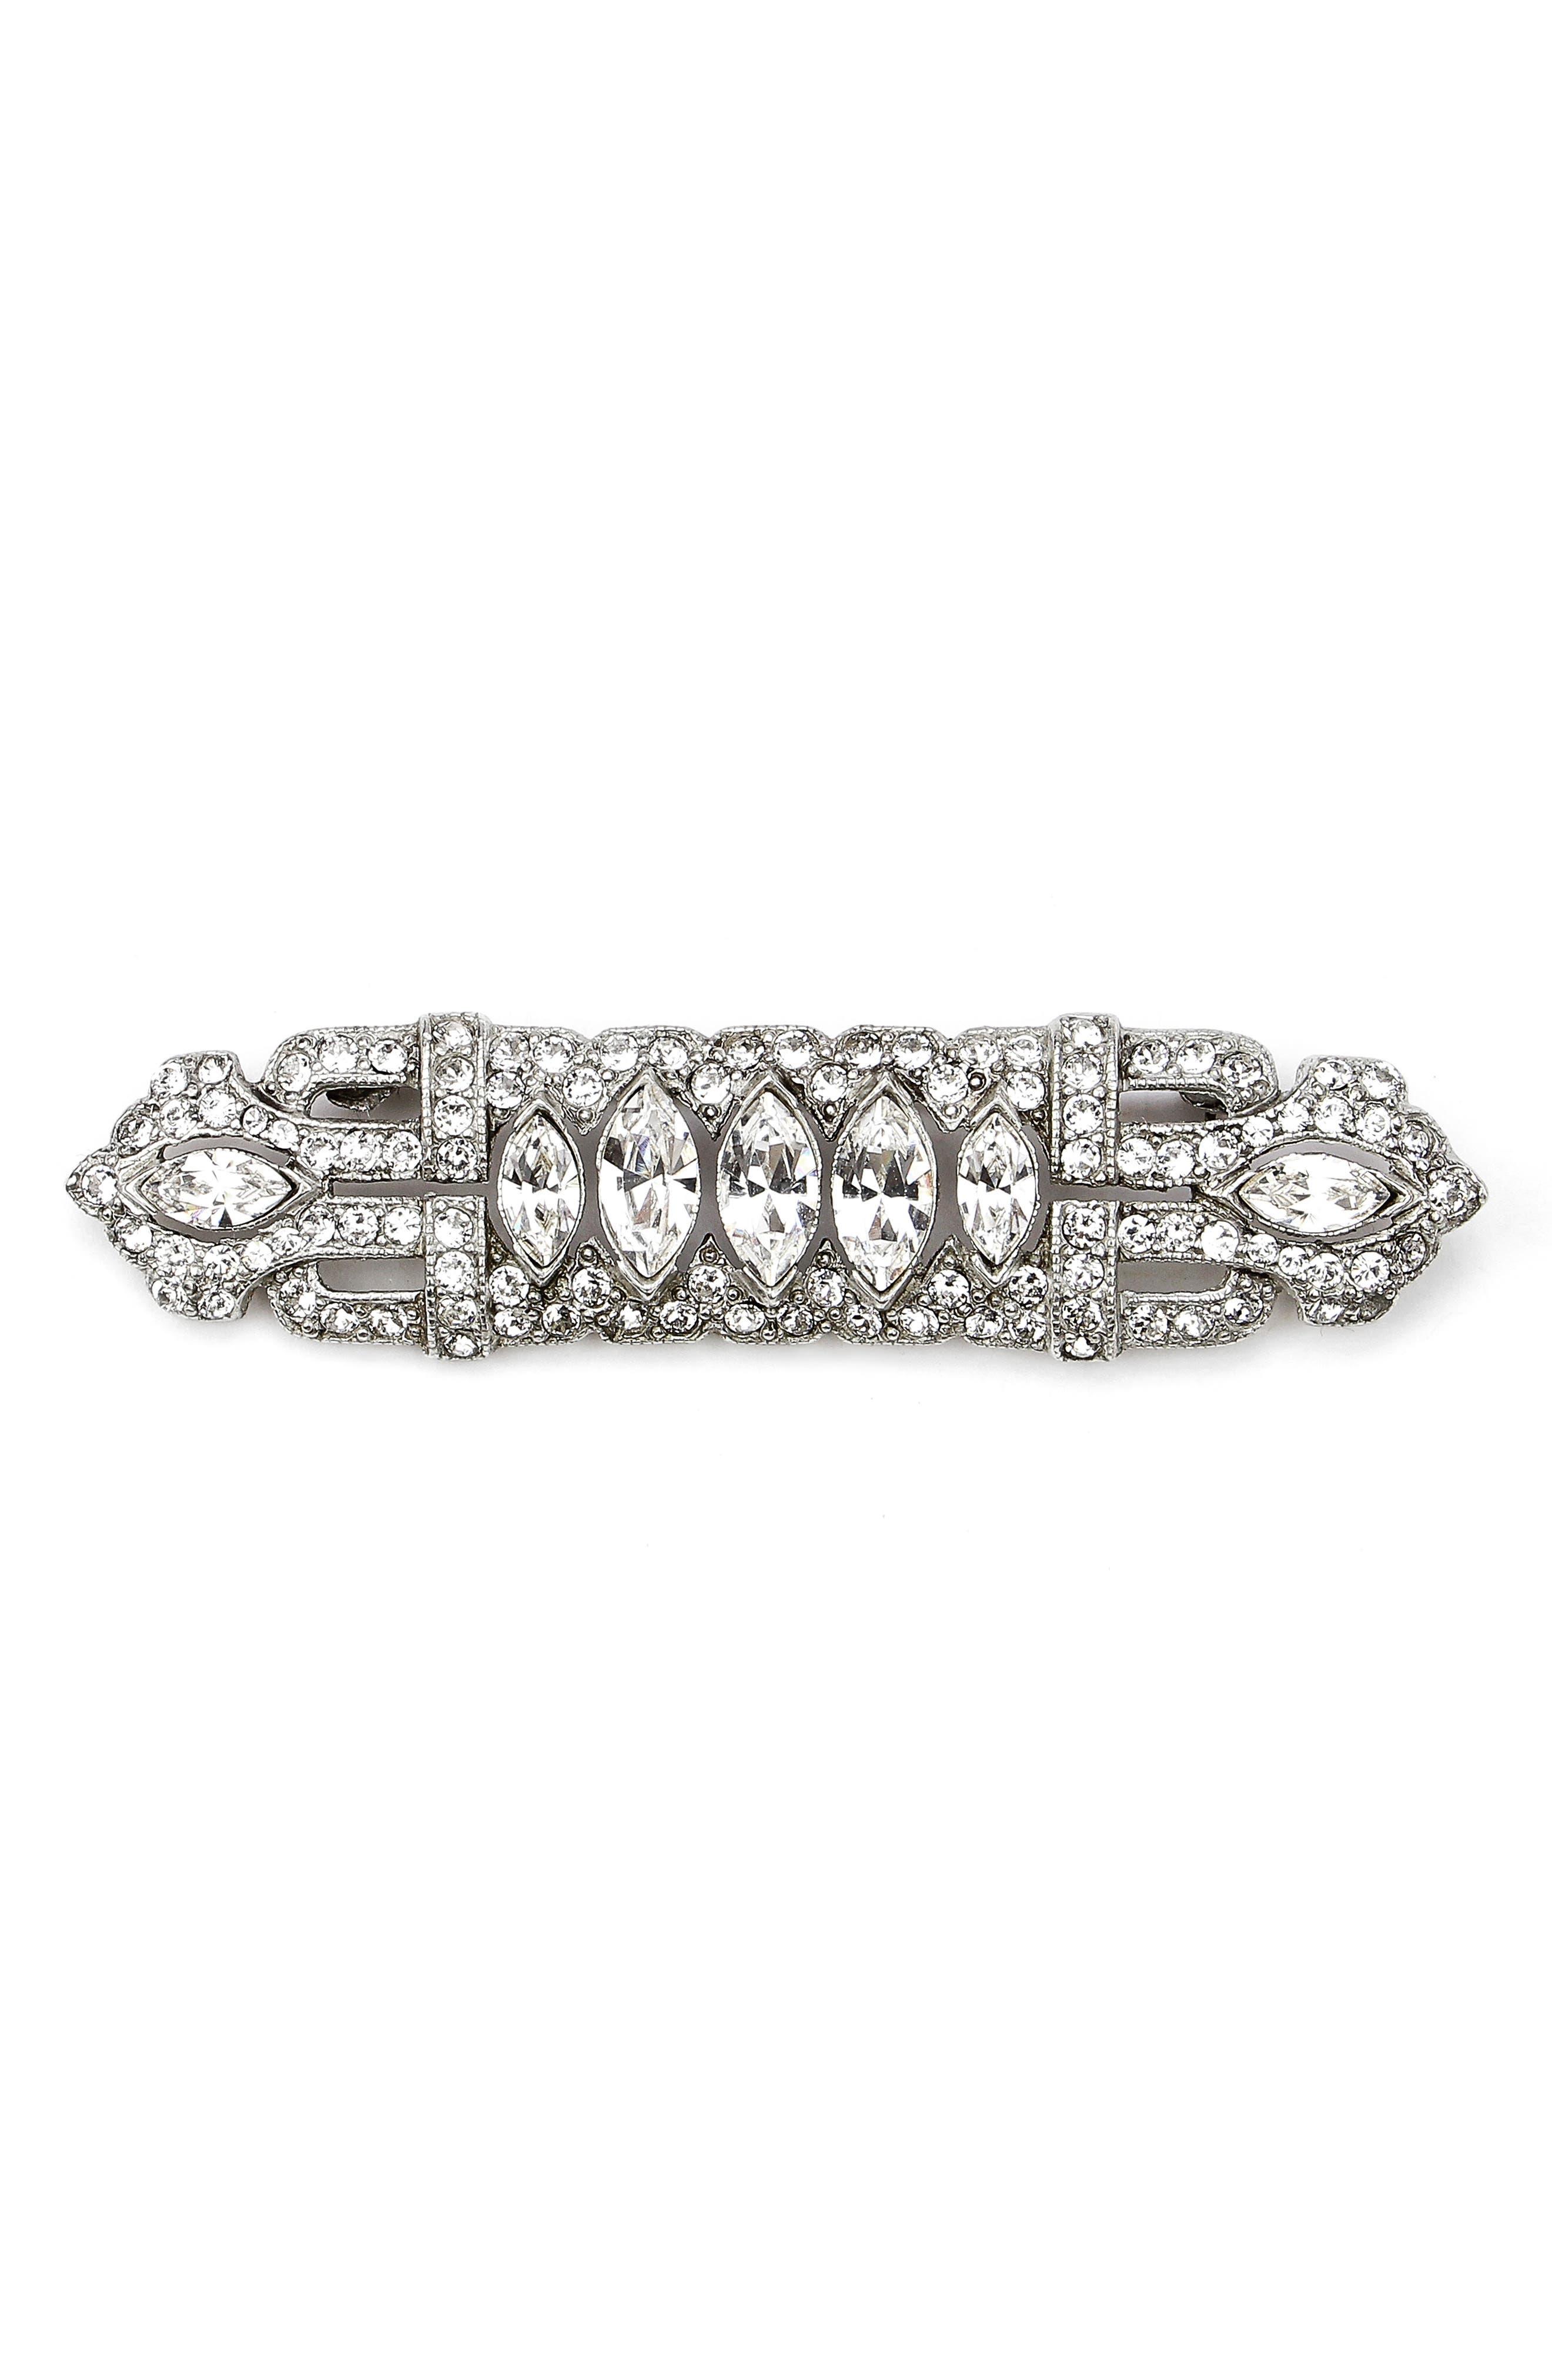 Main Image - Ben-Amun Art Deco Crystal Brooch